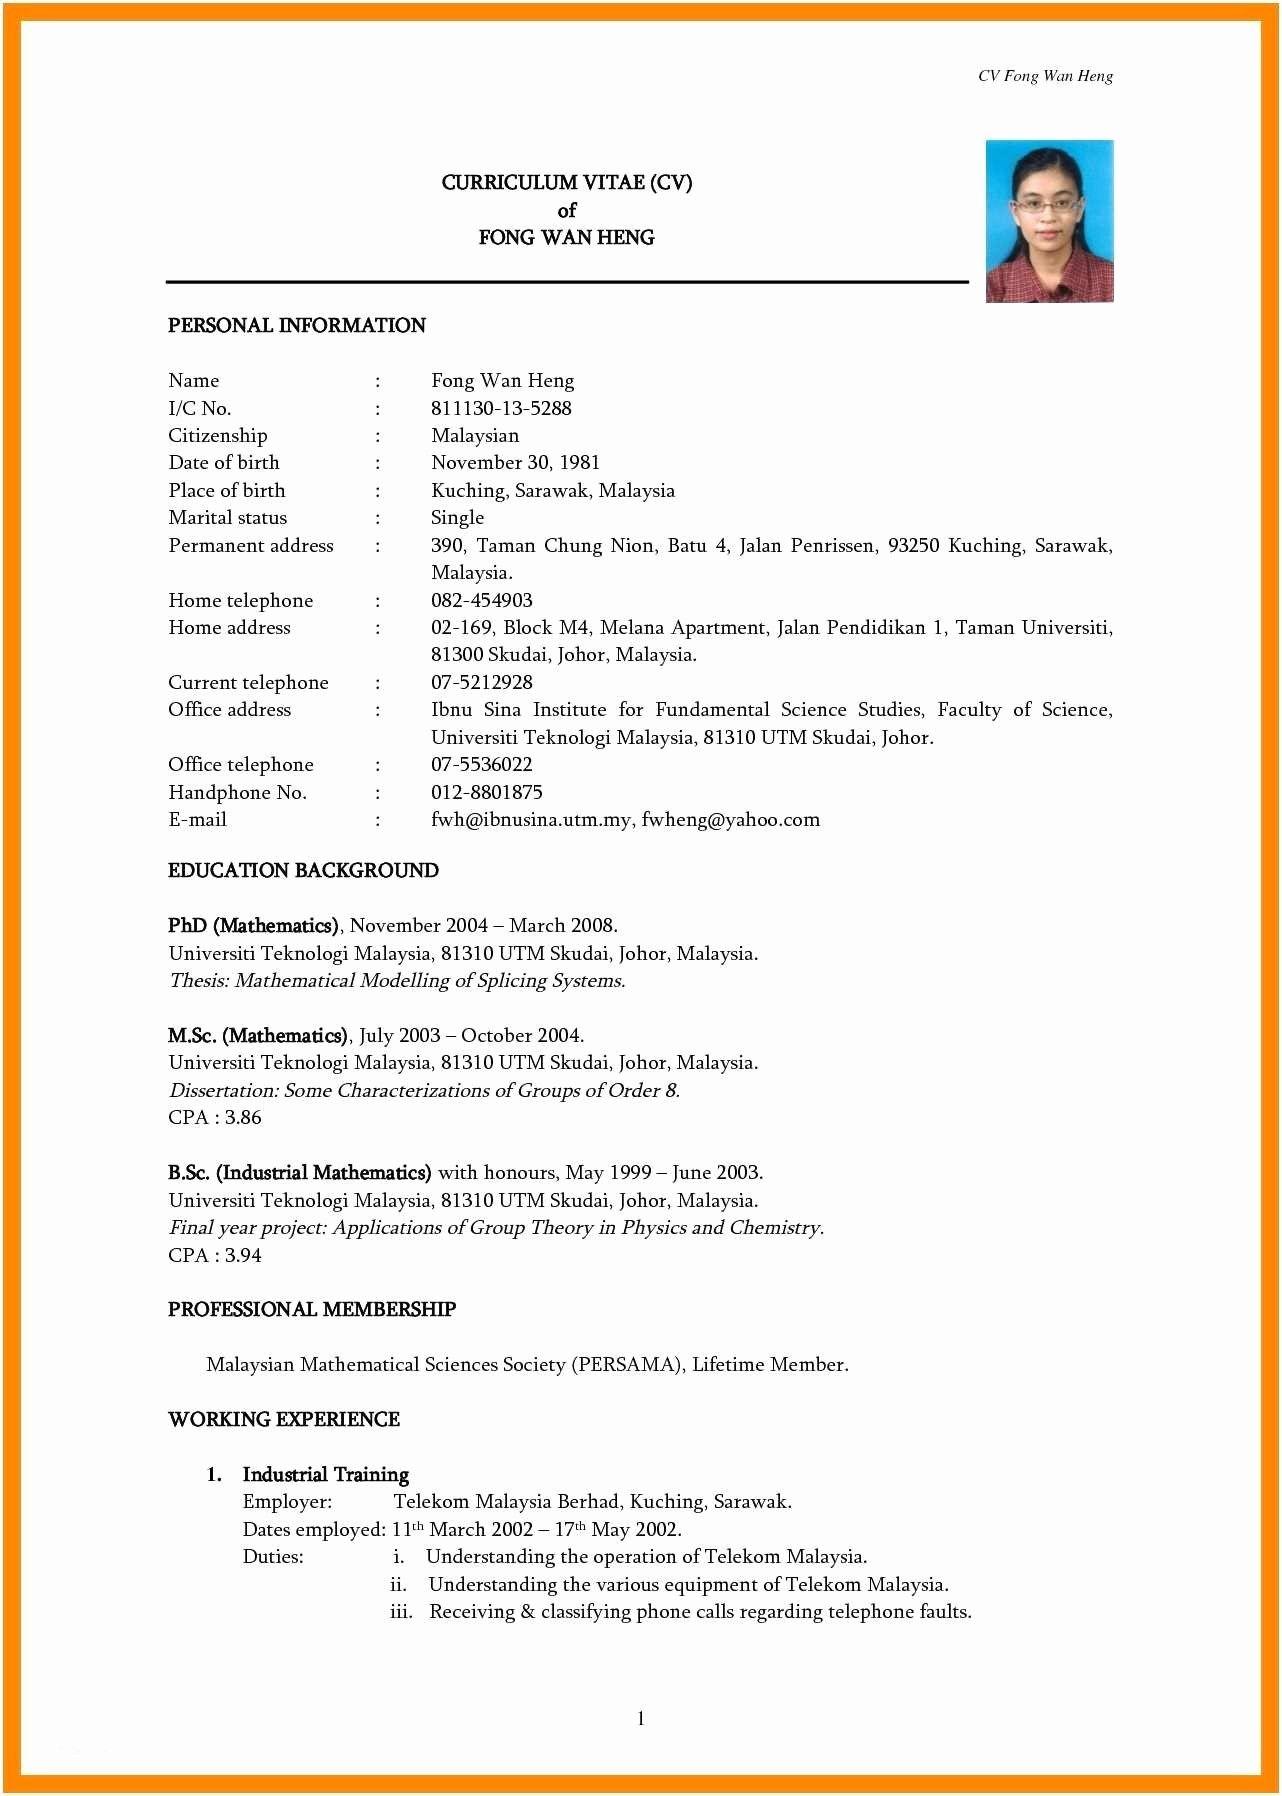 Standard Resume Format 2015 Fresh Resume Samples 2015 Philippines Format New Sam Free Resume Template Download Simple Resume Template Free Resume Template Word